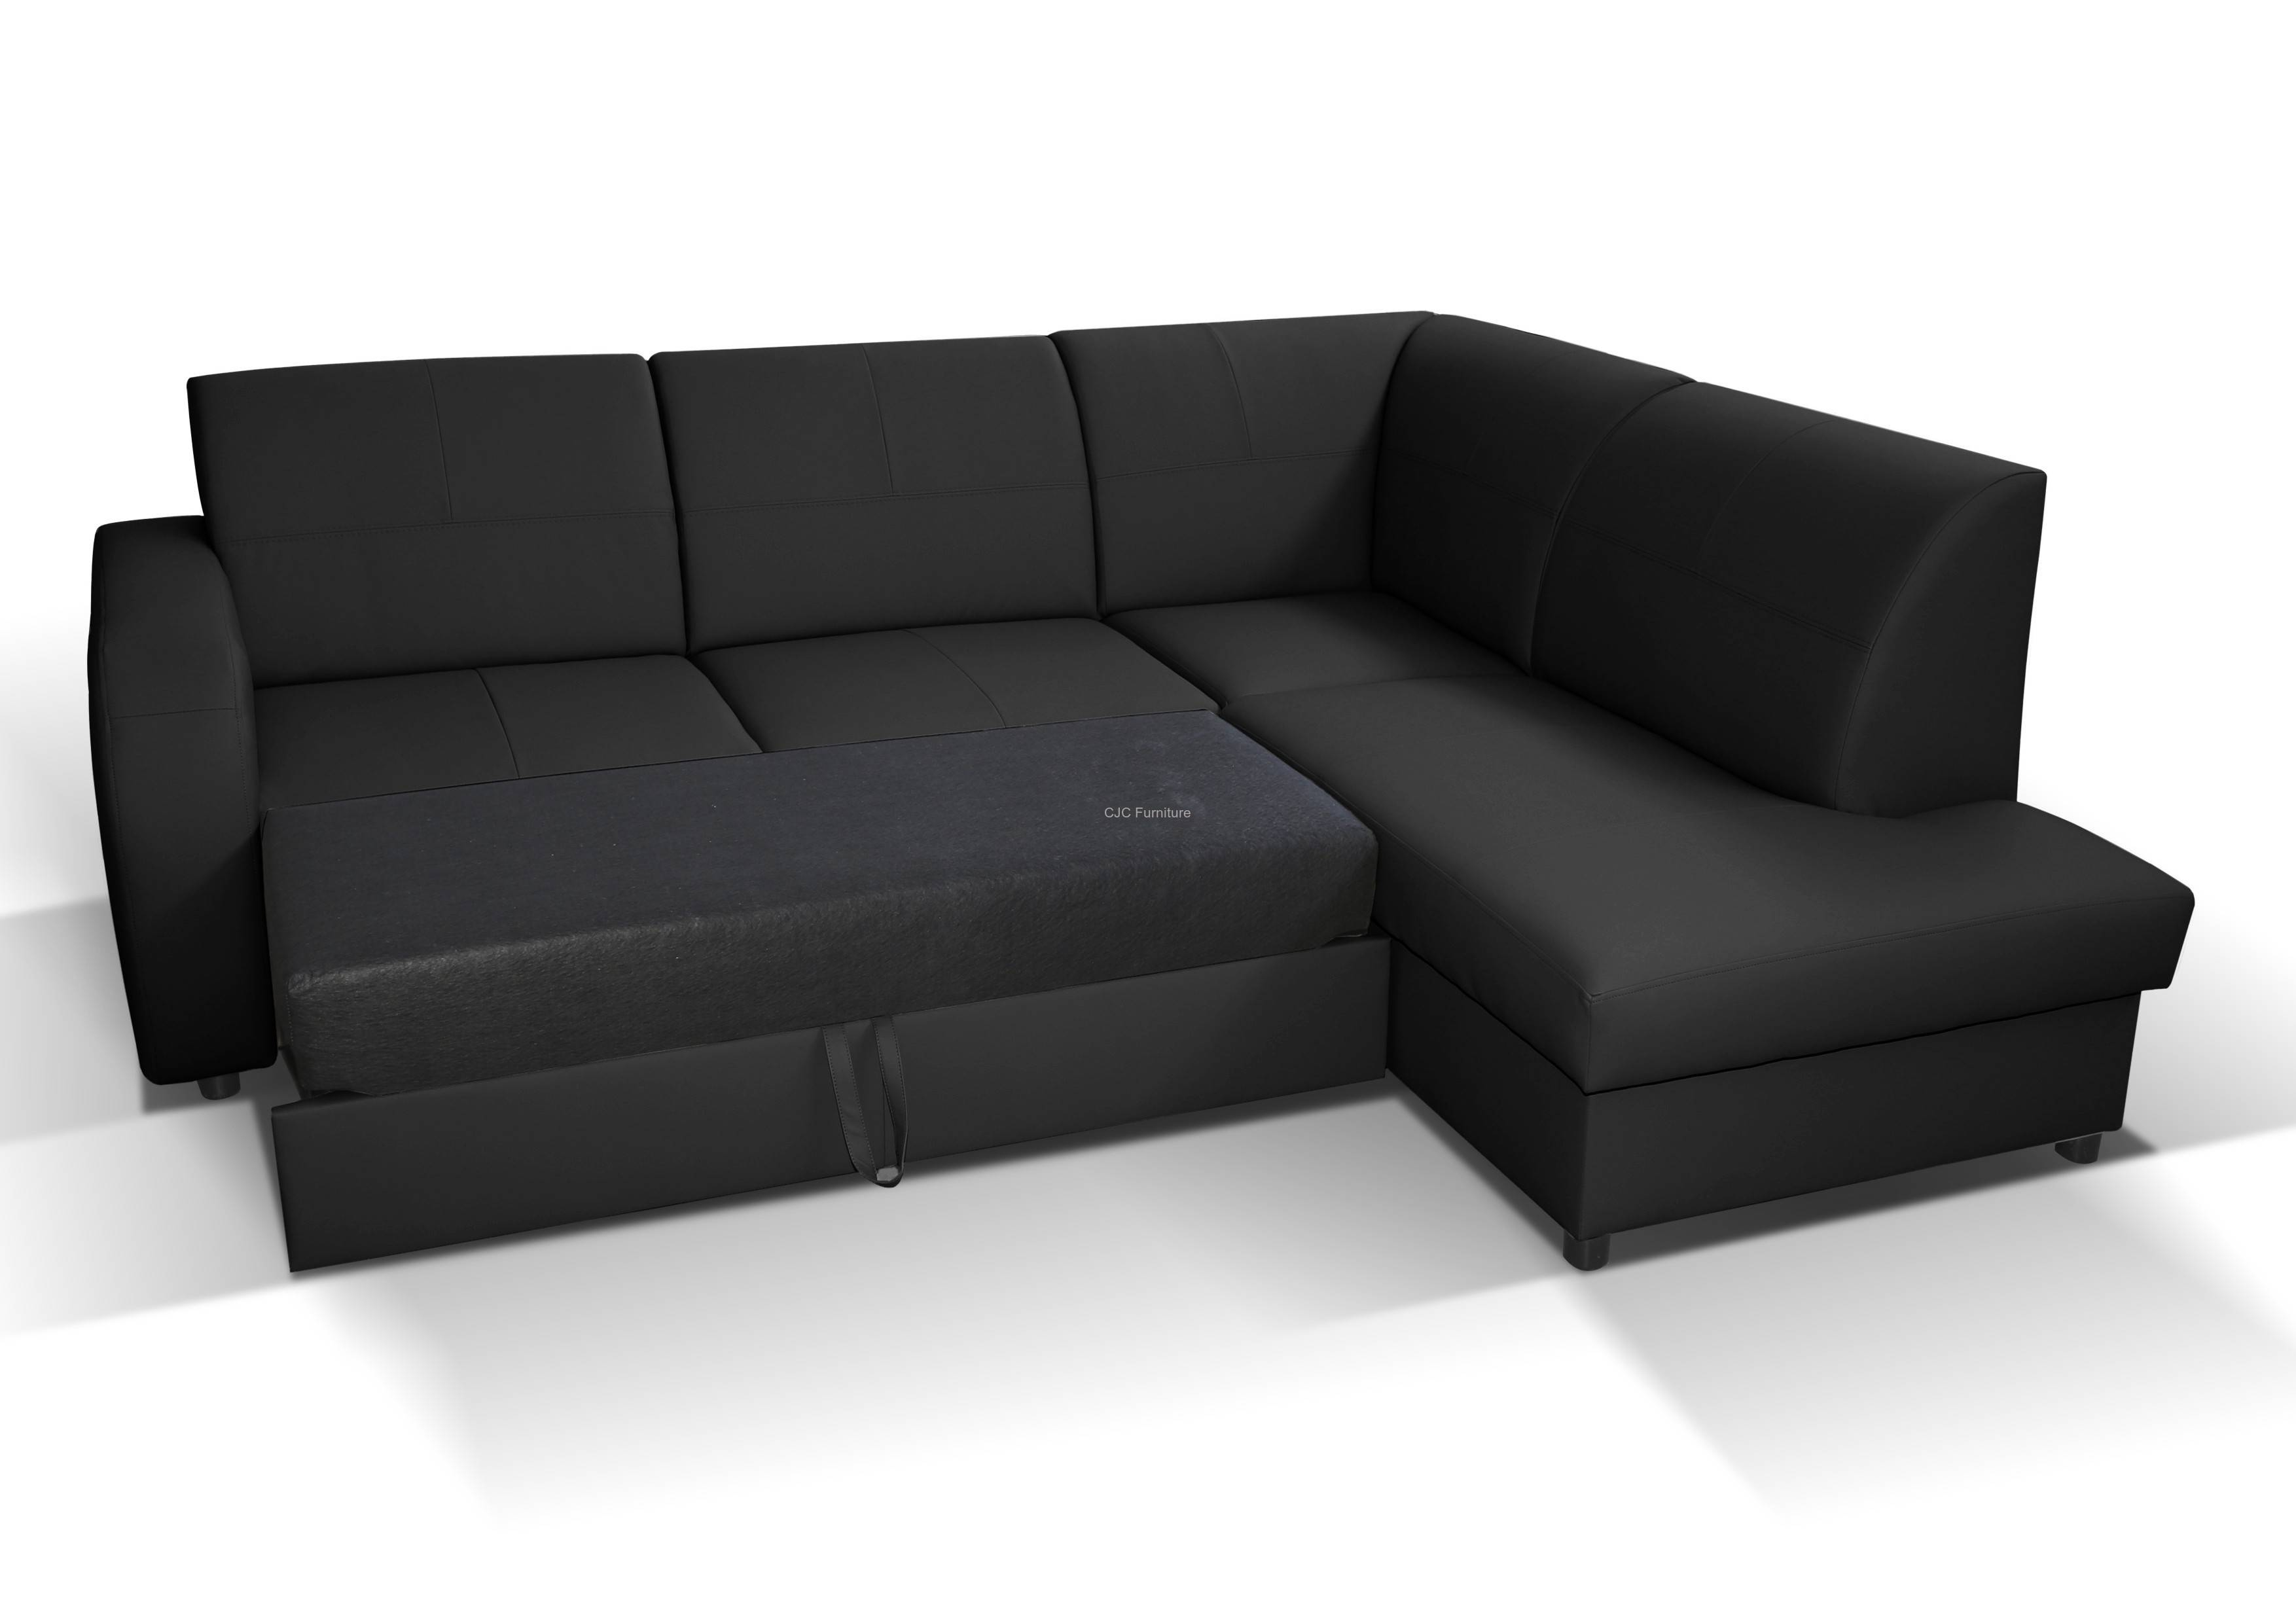 Small Corner Sofas Uk Cheap | Centerfieldbar throughout Black Corner Sofas (Image 13 of 15)